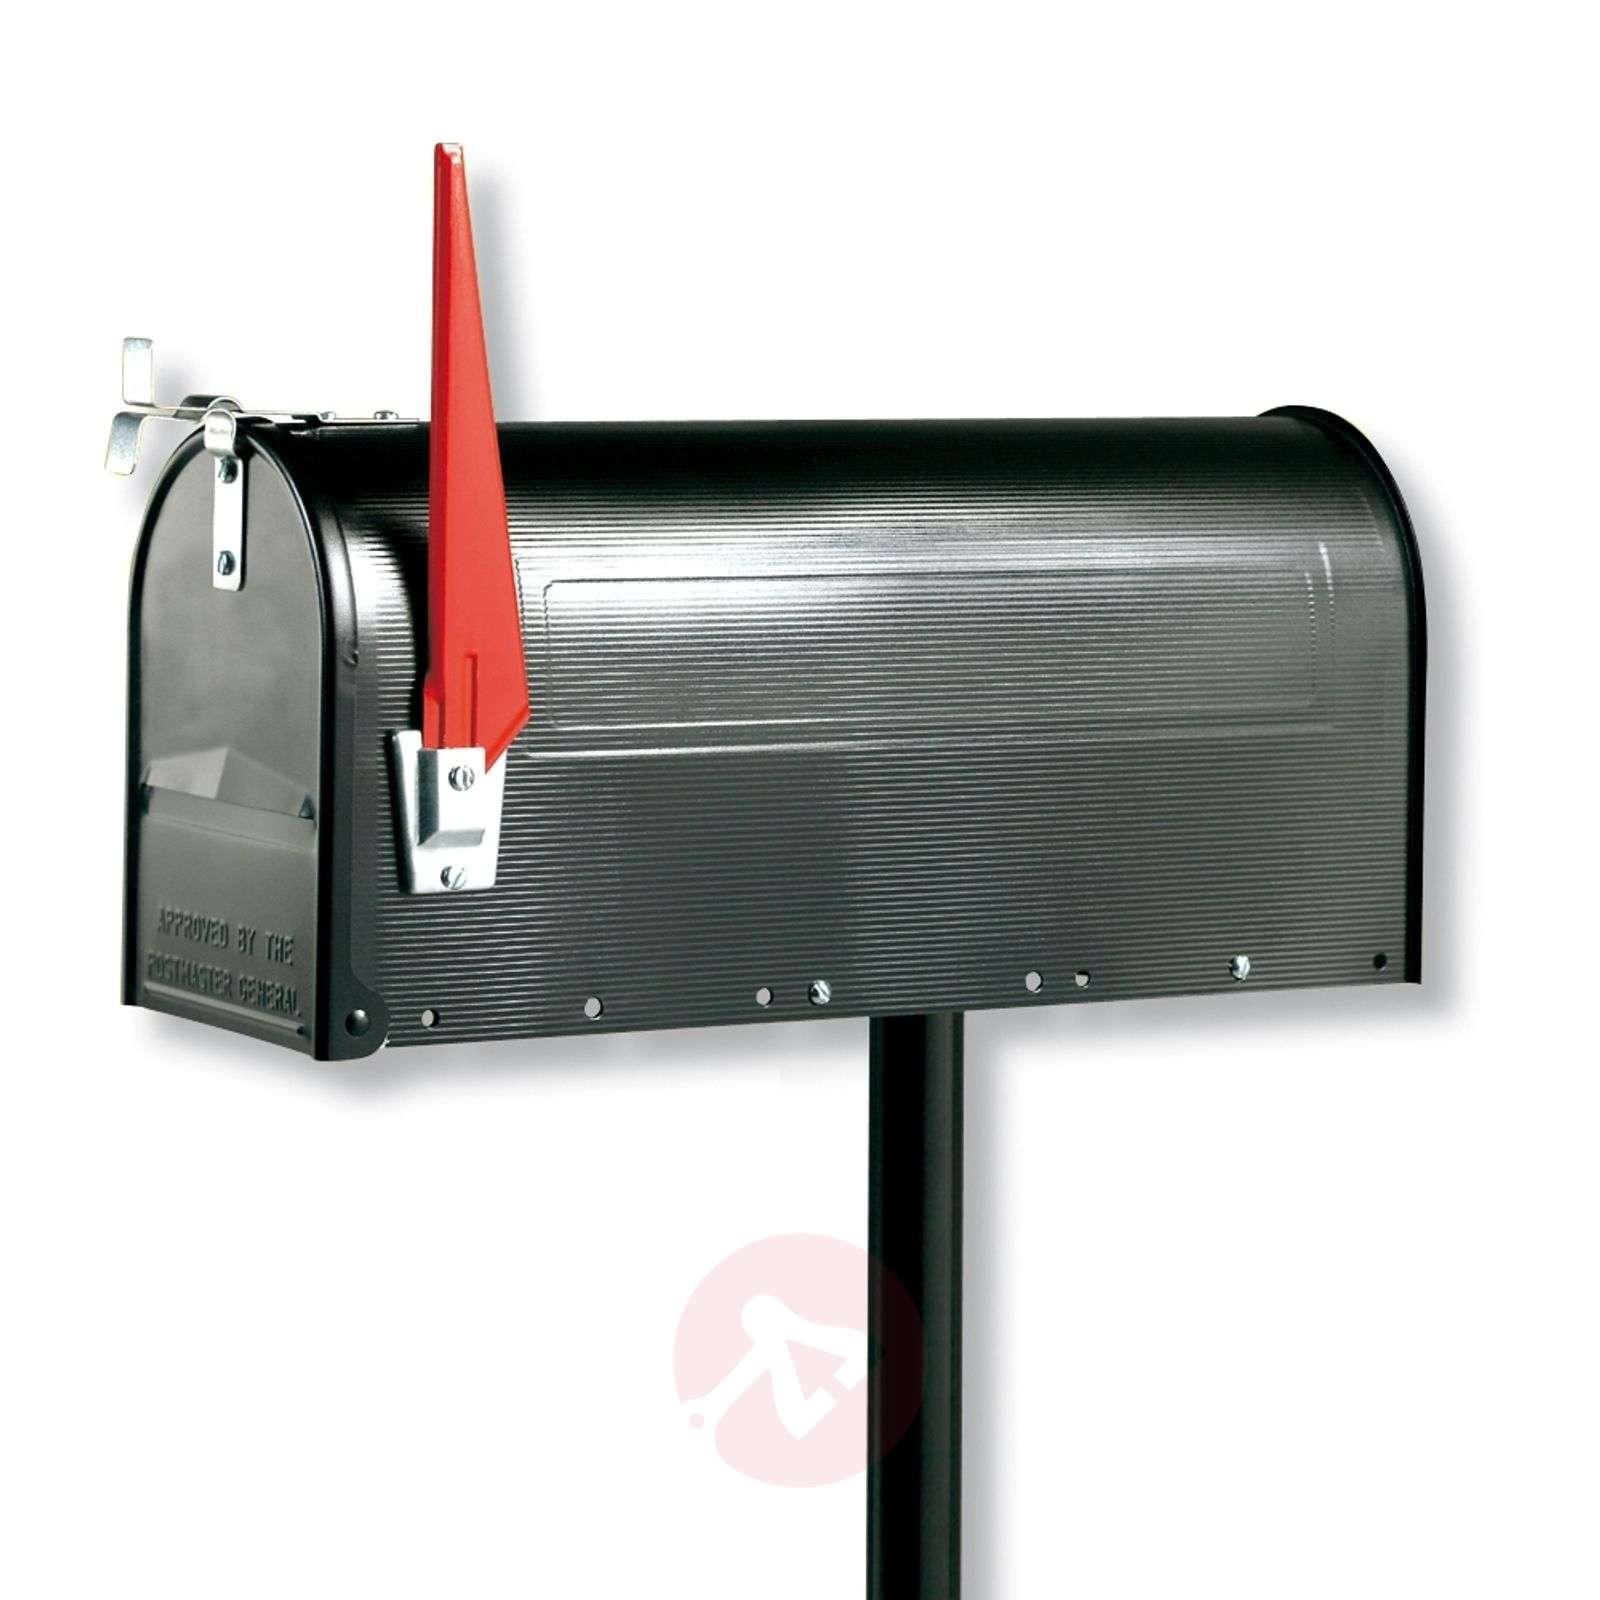 893 S-tukipylväs U.S. Mailbox-postilaatikolle-1532119-01